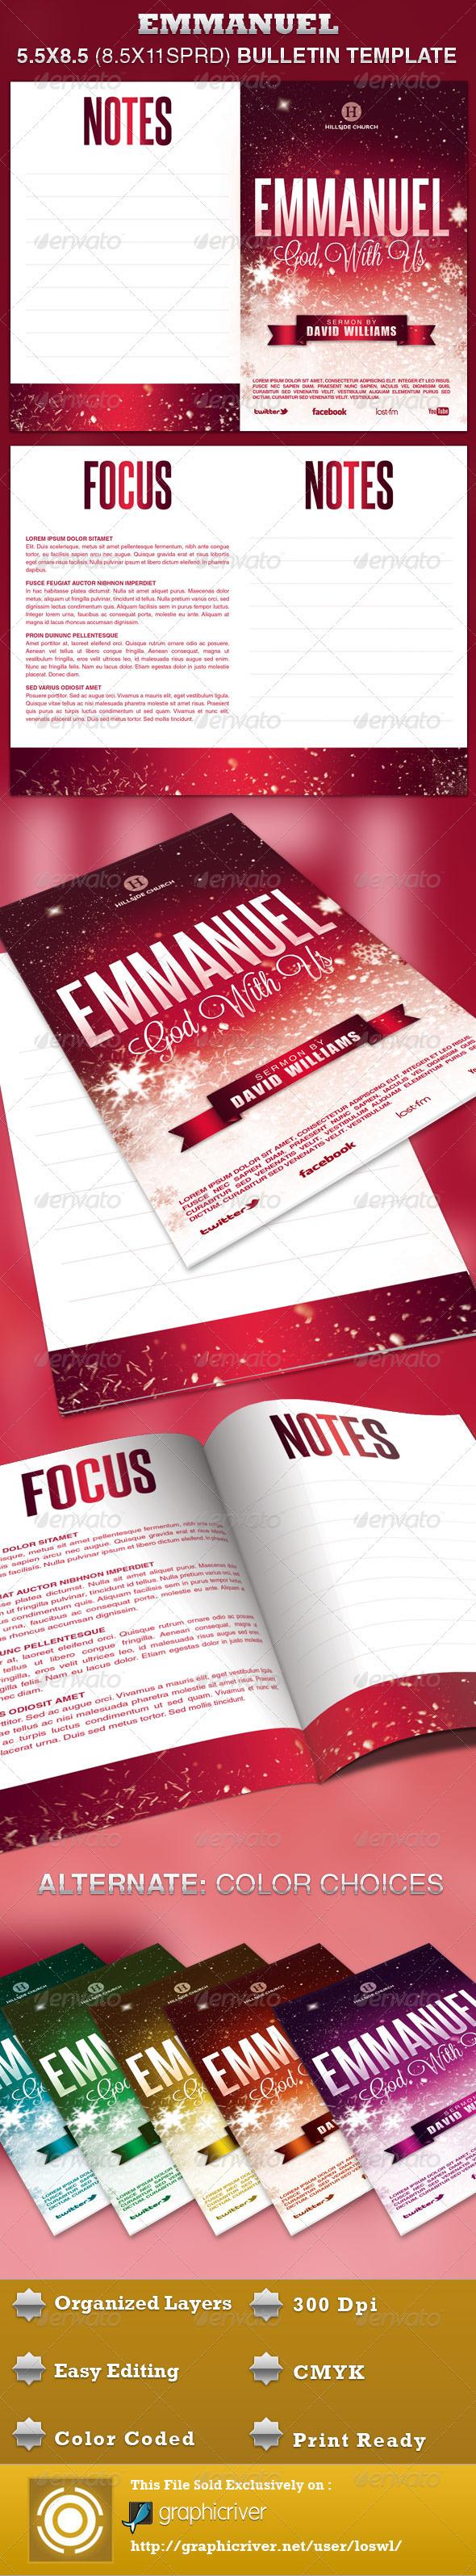 Emmanuel Church Bulletin Template - Informational Brochures